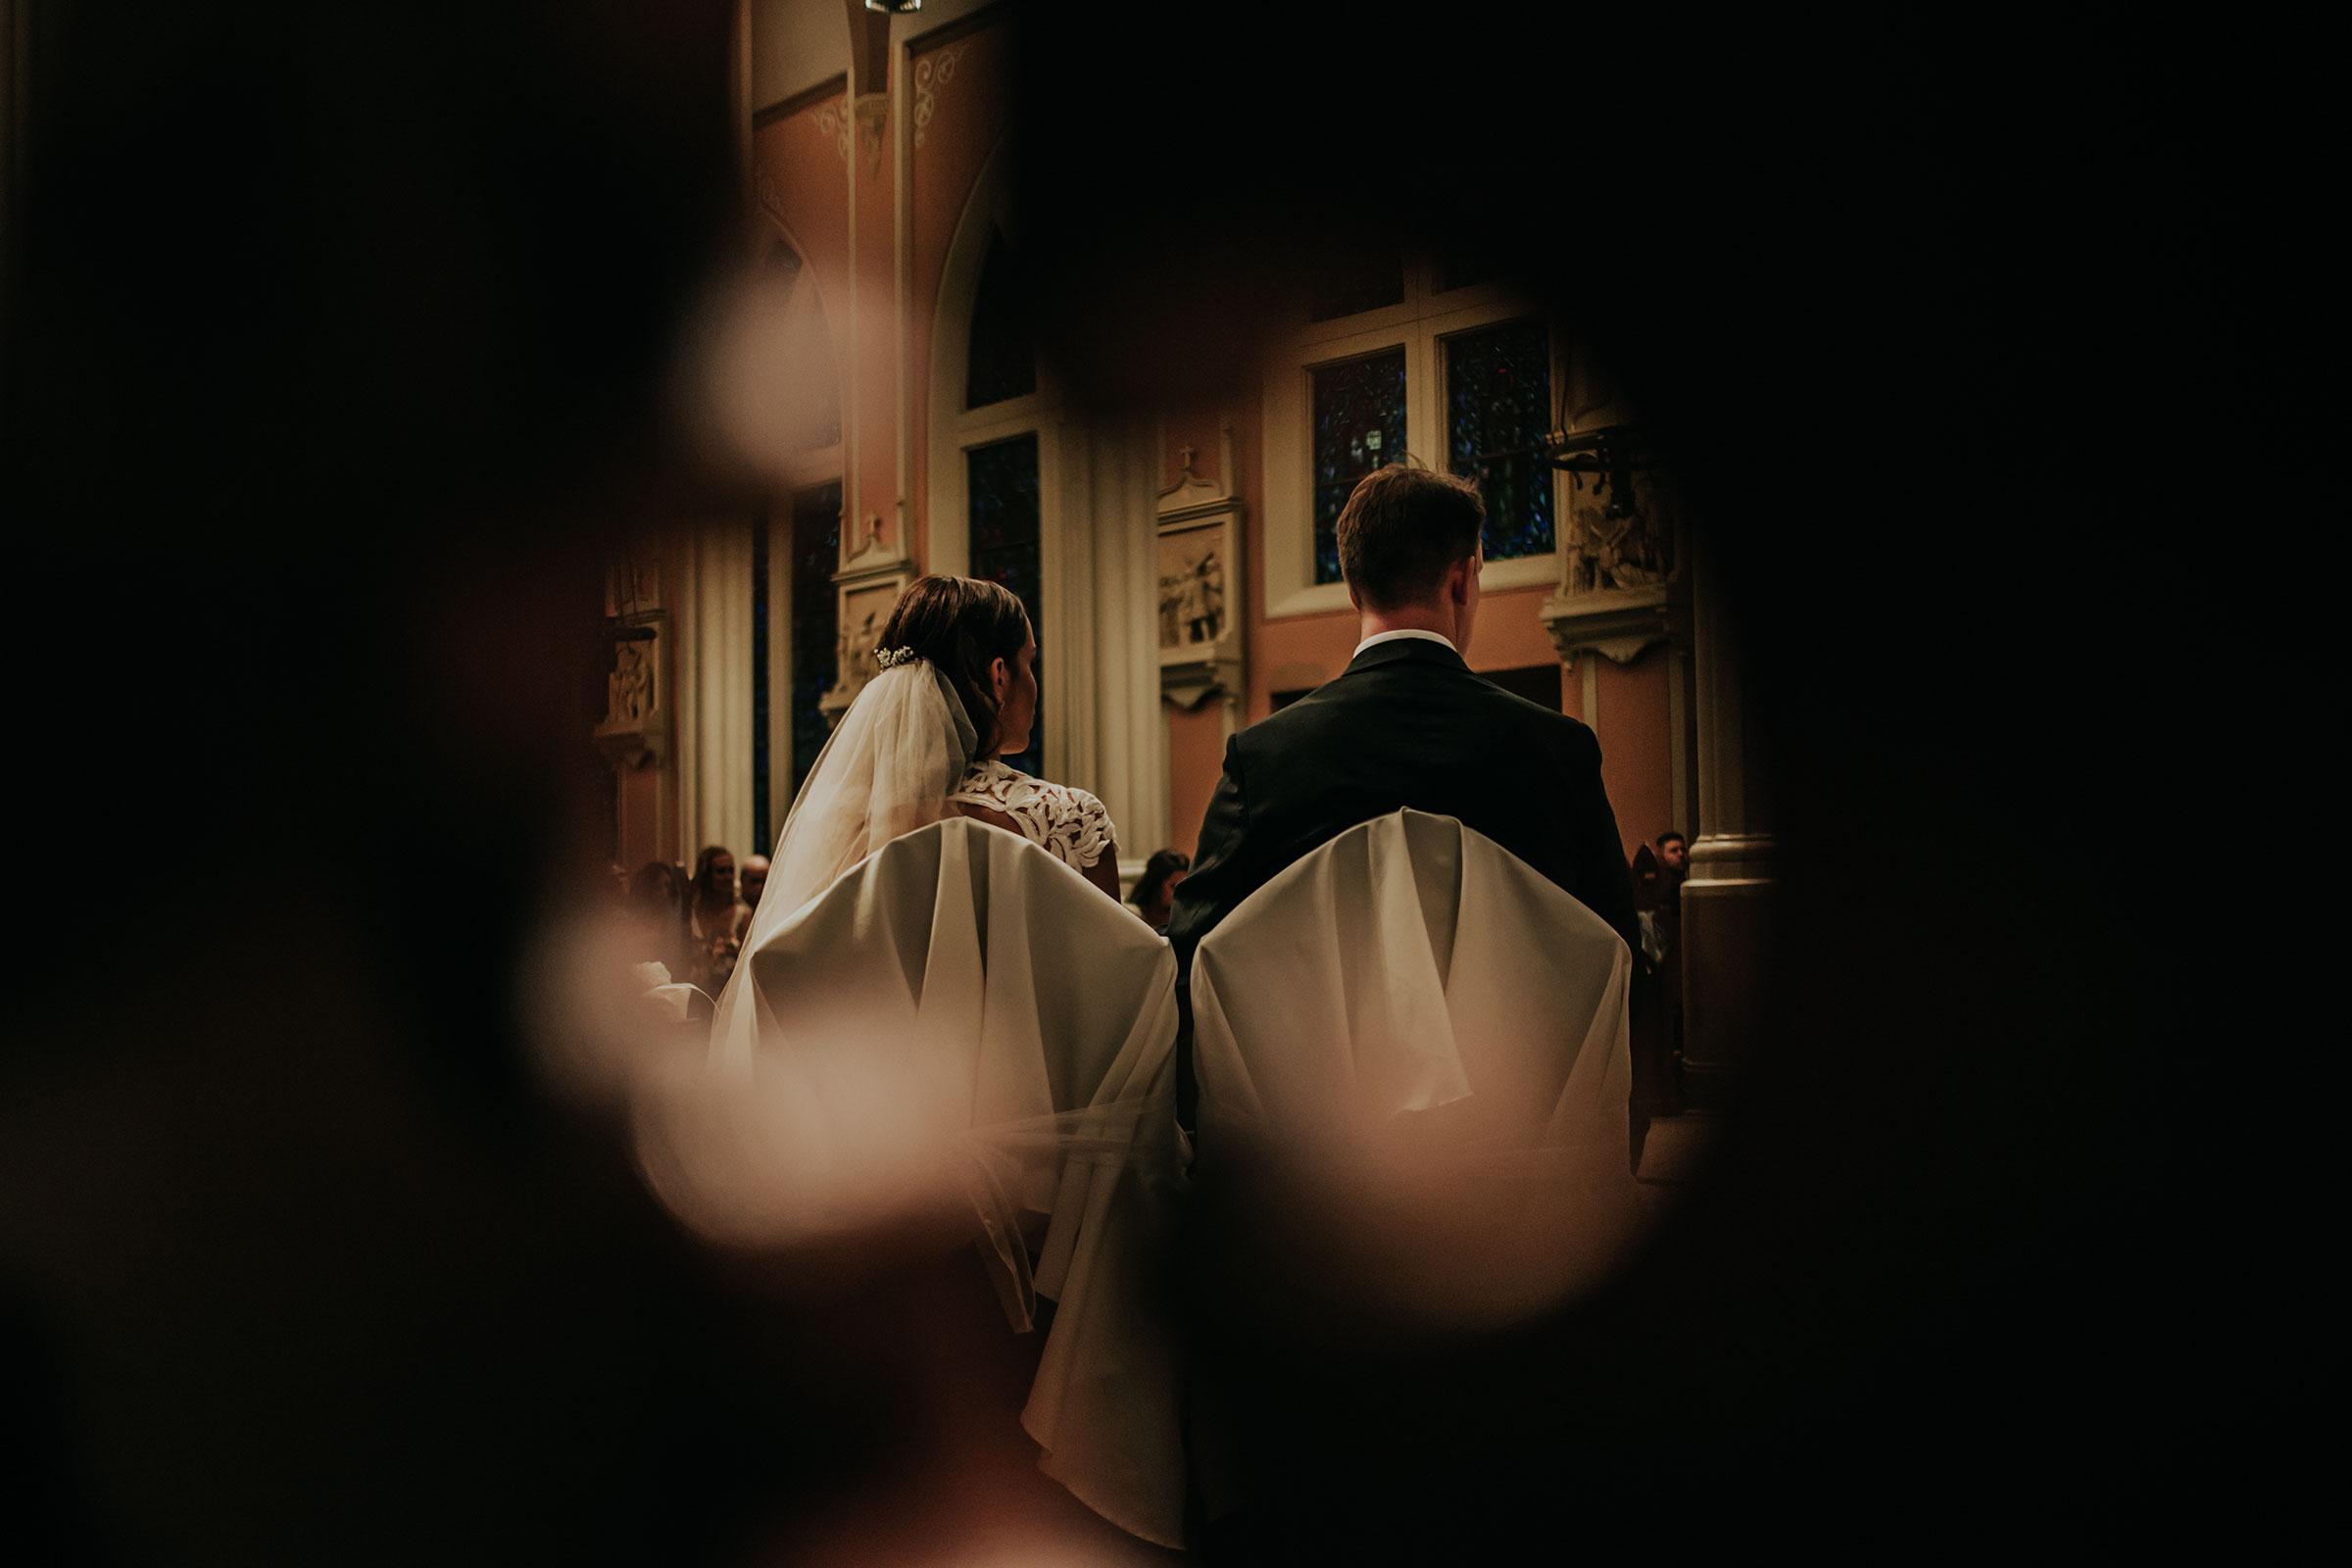 bride-groom-sitting-at-ceremony-st-johns-church-at-creighton-omaha-nebraska-raelyn-ramey-photography.jpg